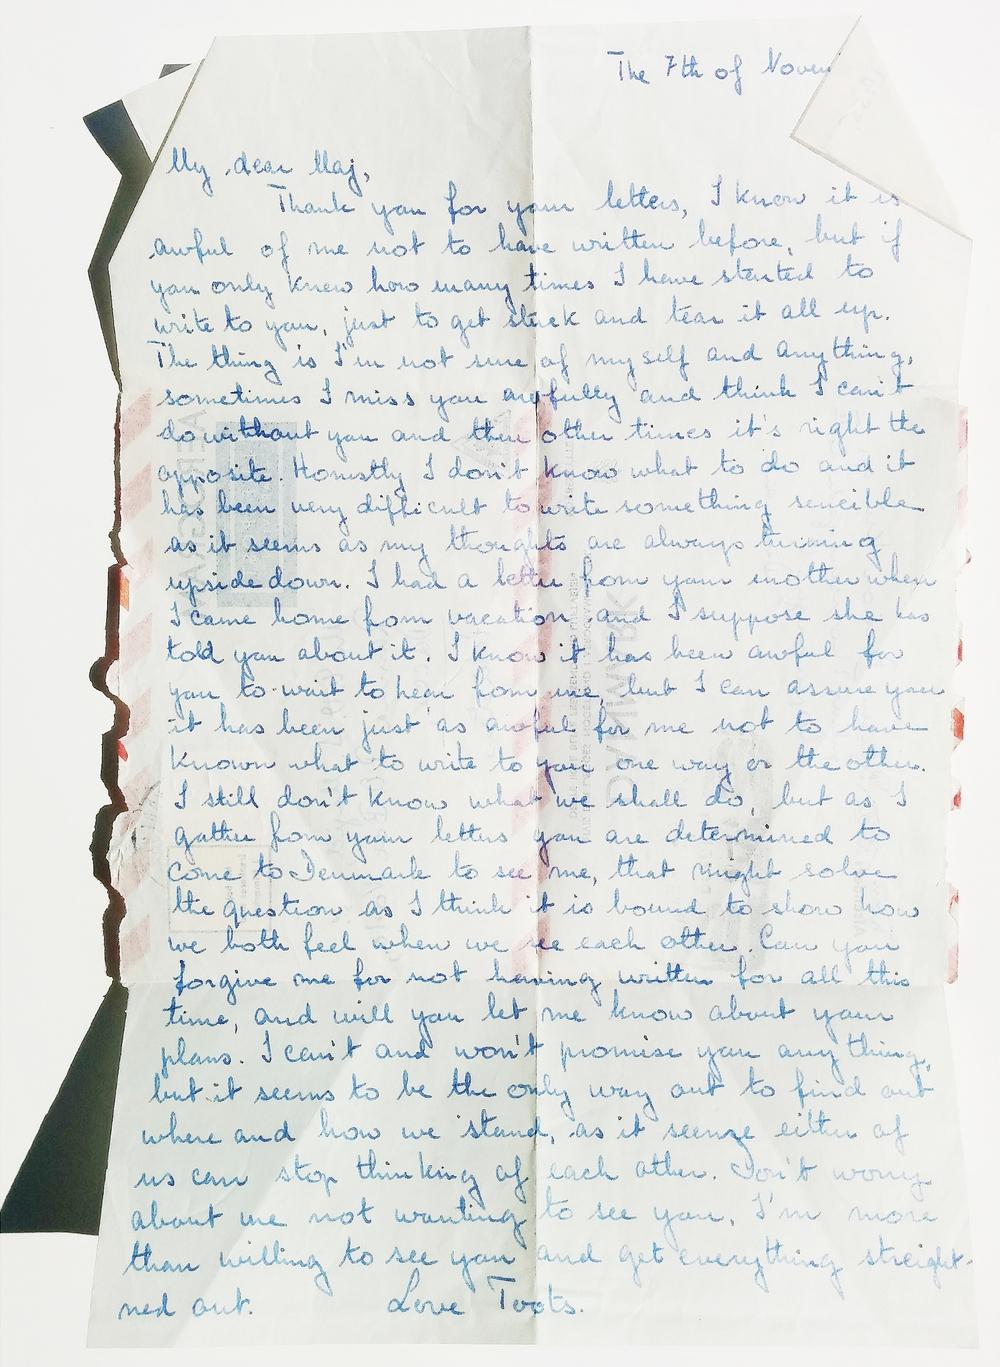 November 7th, 1955